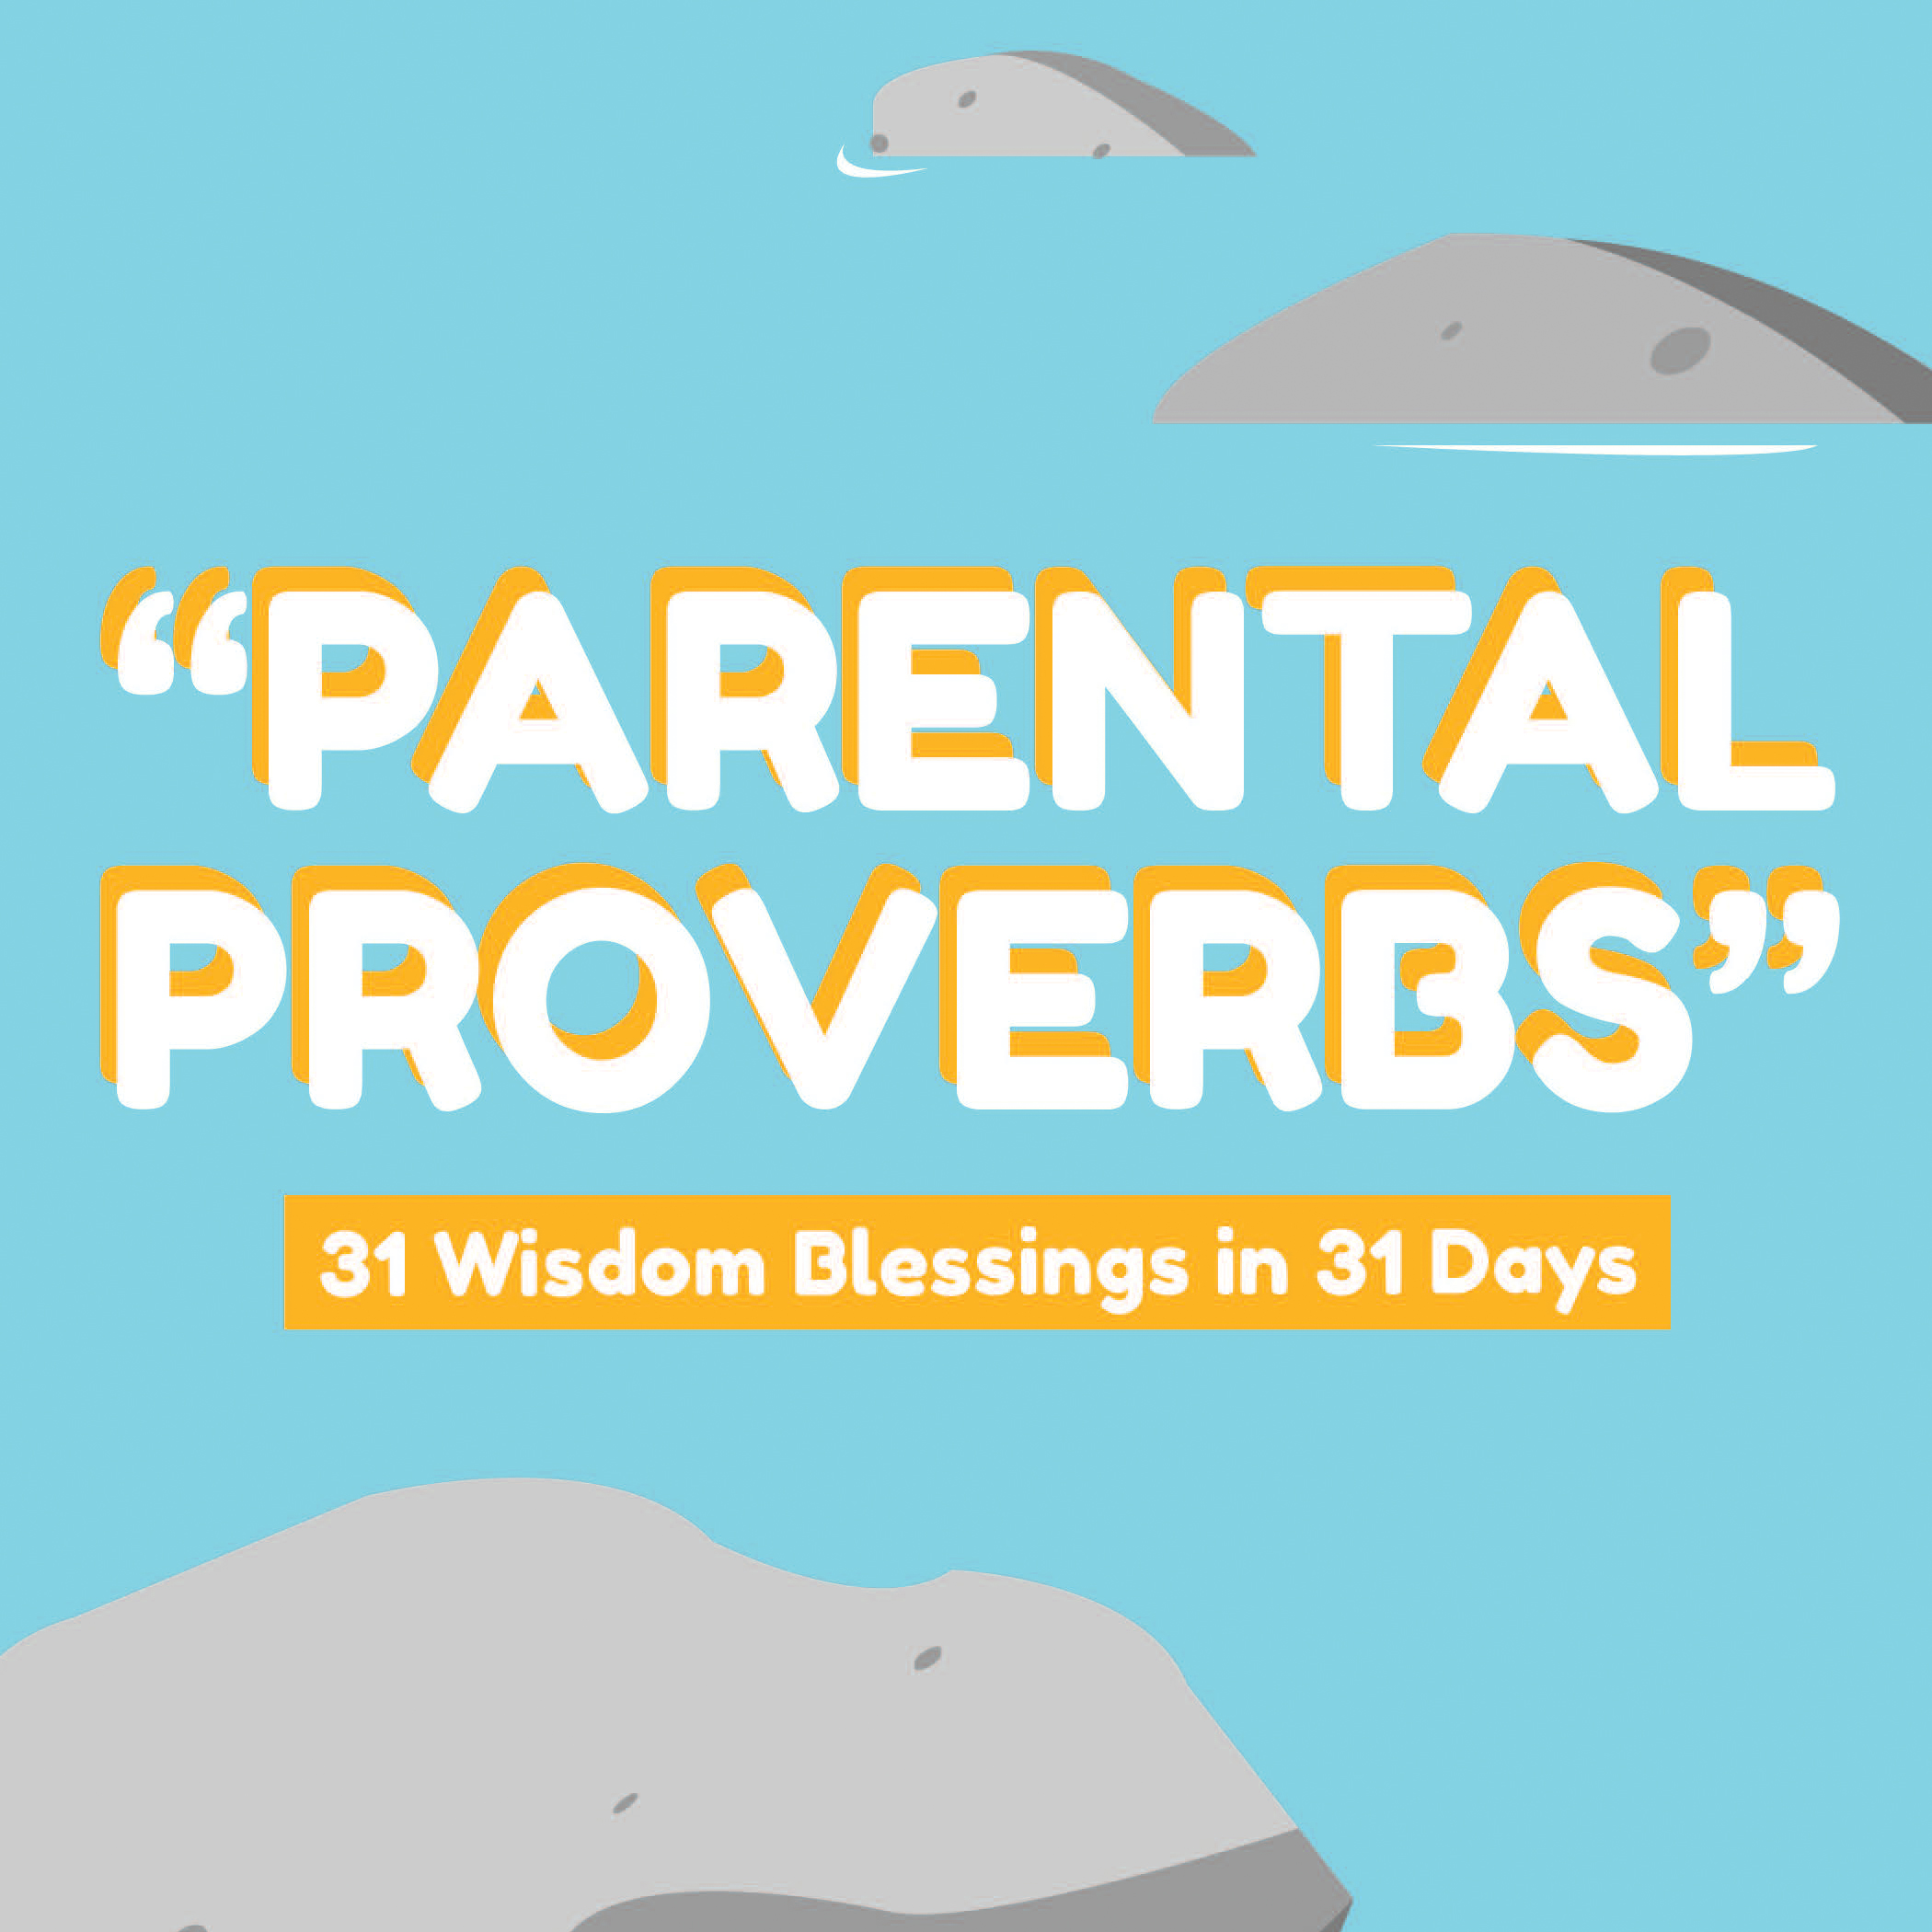 Parental-Proverbs-1-1.jpg